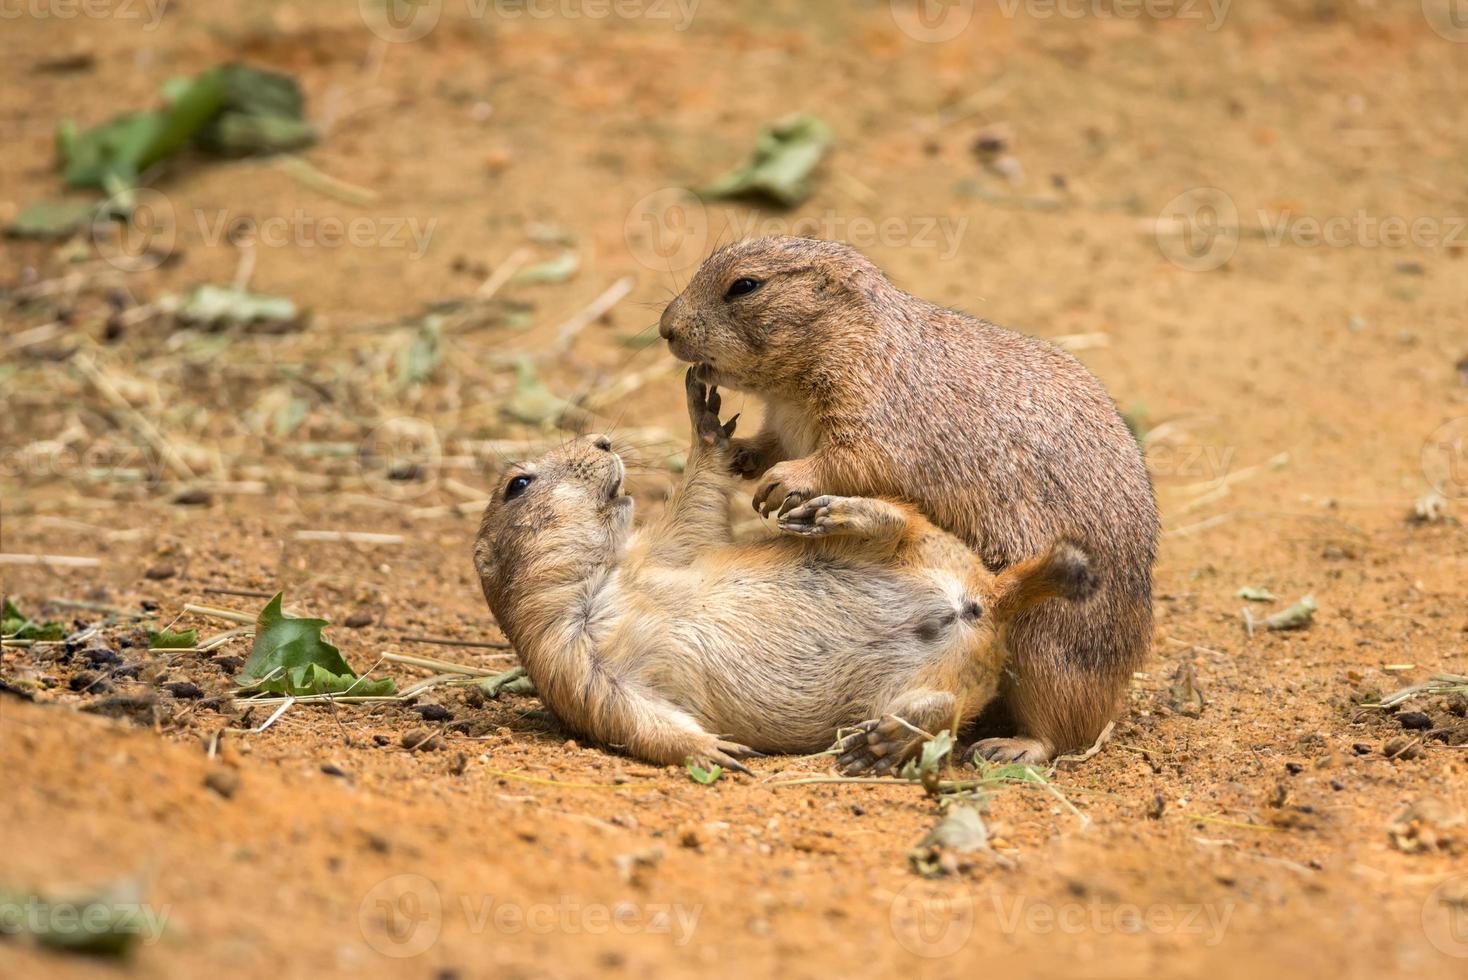 volwassen prairiehonden spelen vechten foto